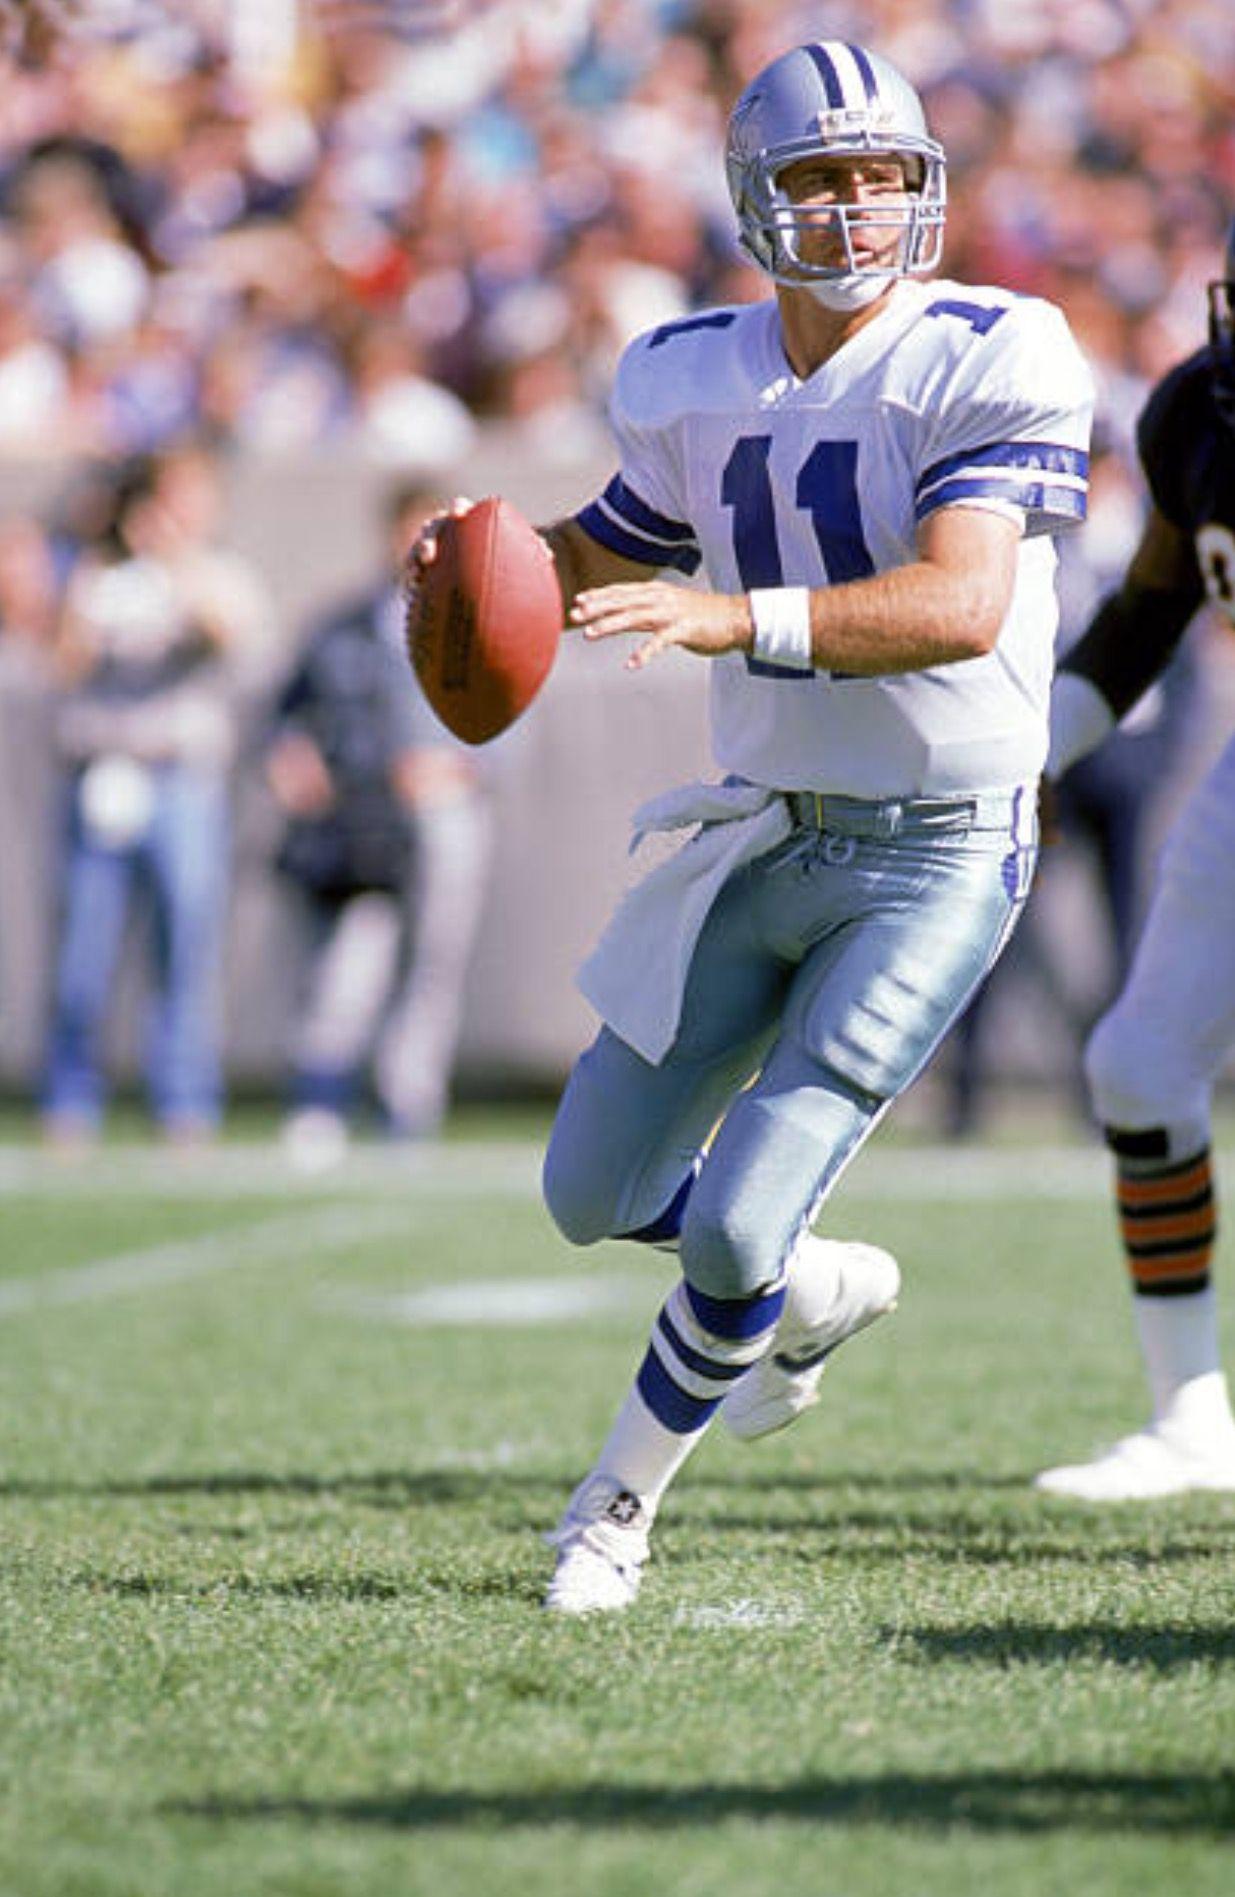 5b0d34f1d52 Qb Danny White Cowboys Men, Dallas Cowboys Football, School Football,  Football Helmets,